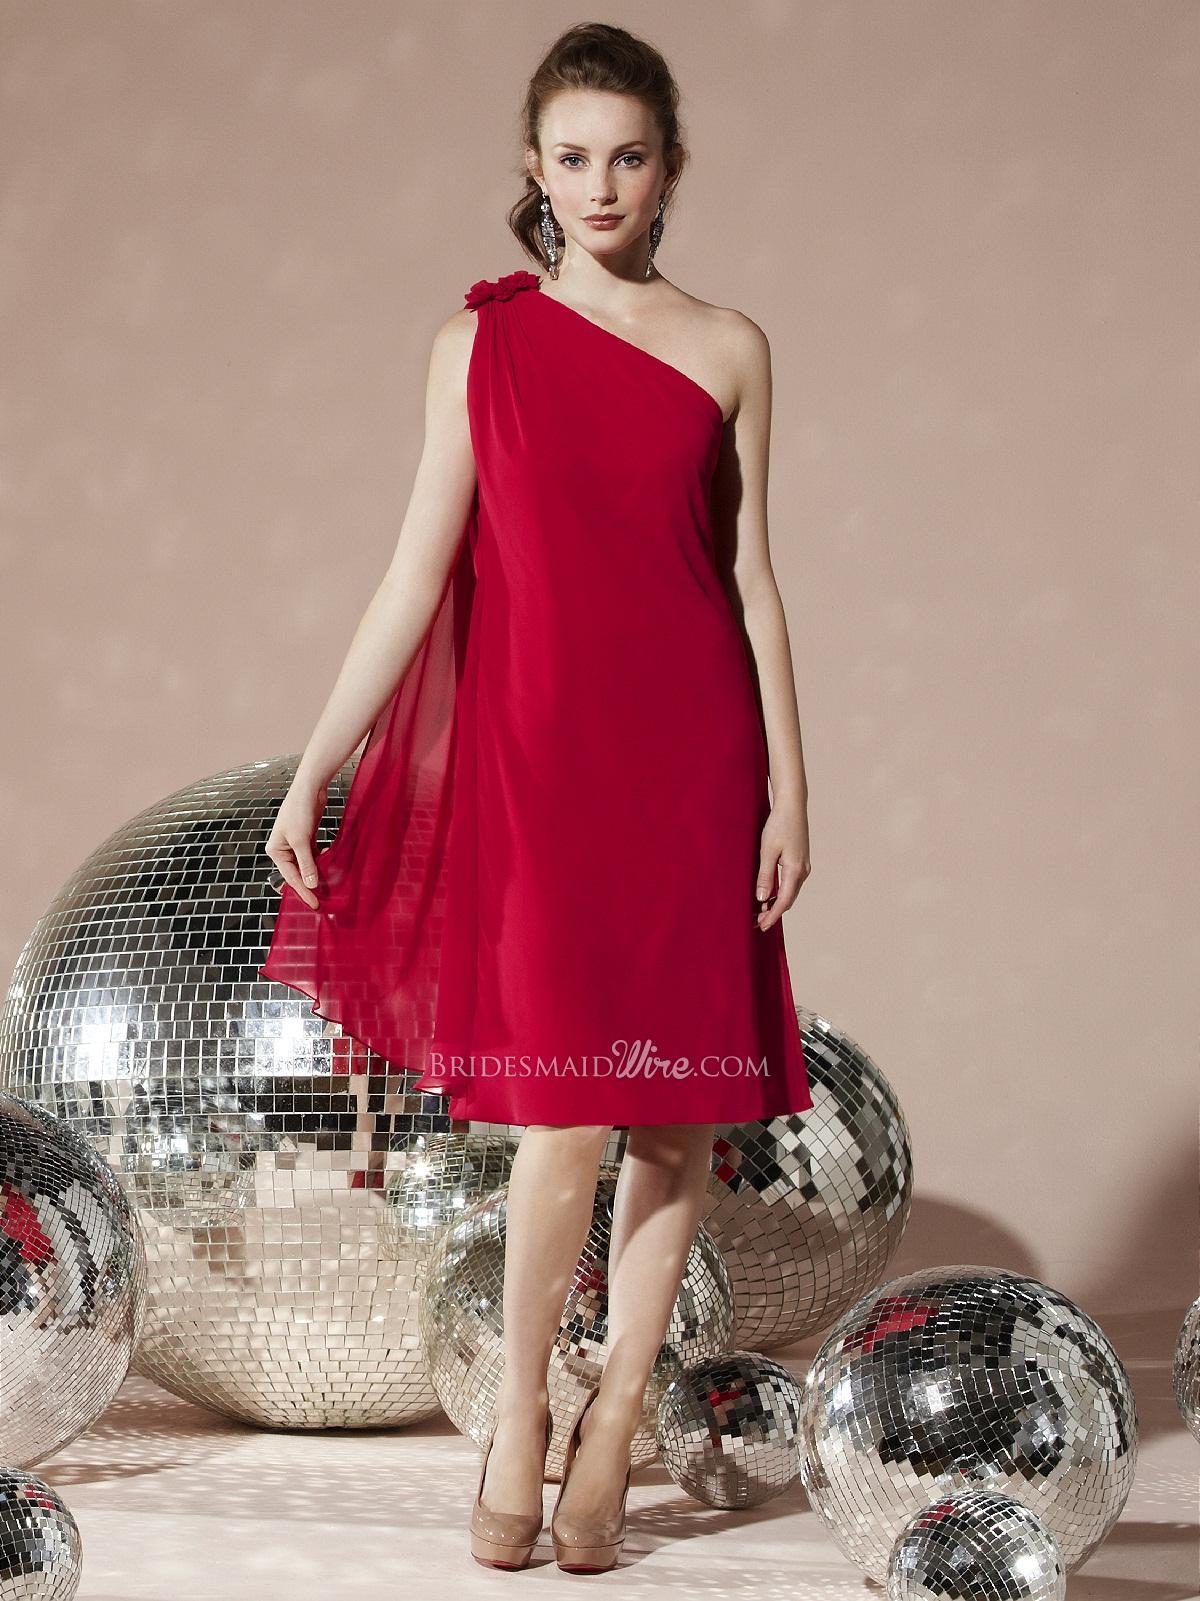 Make this Summer dress